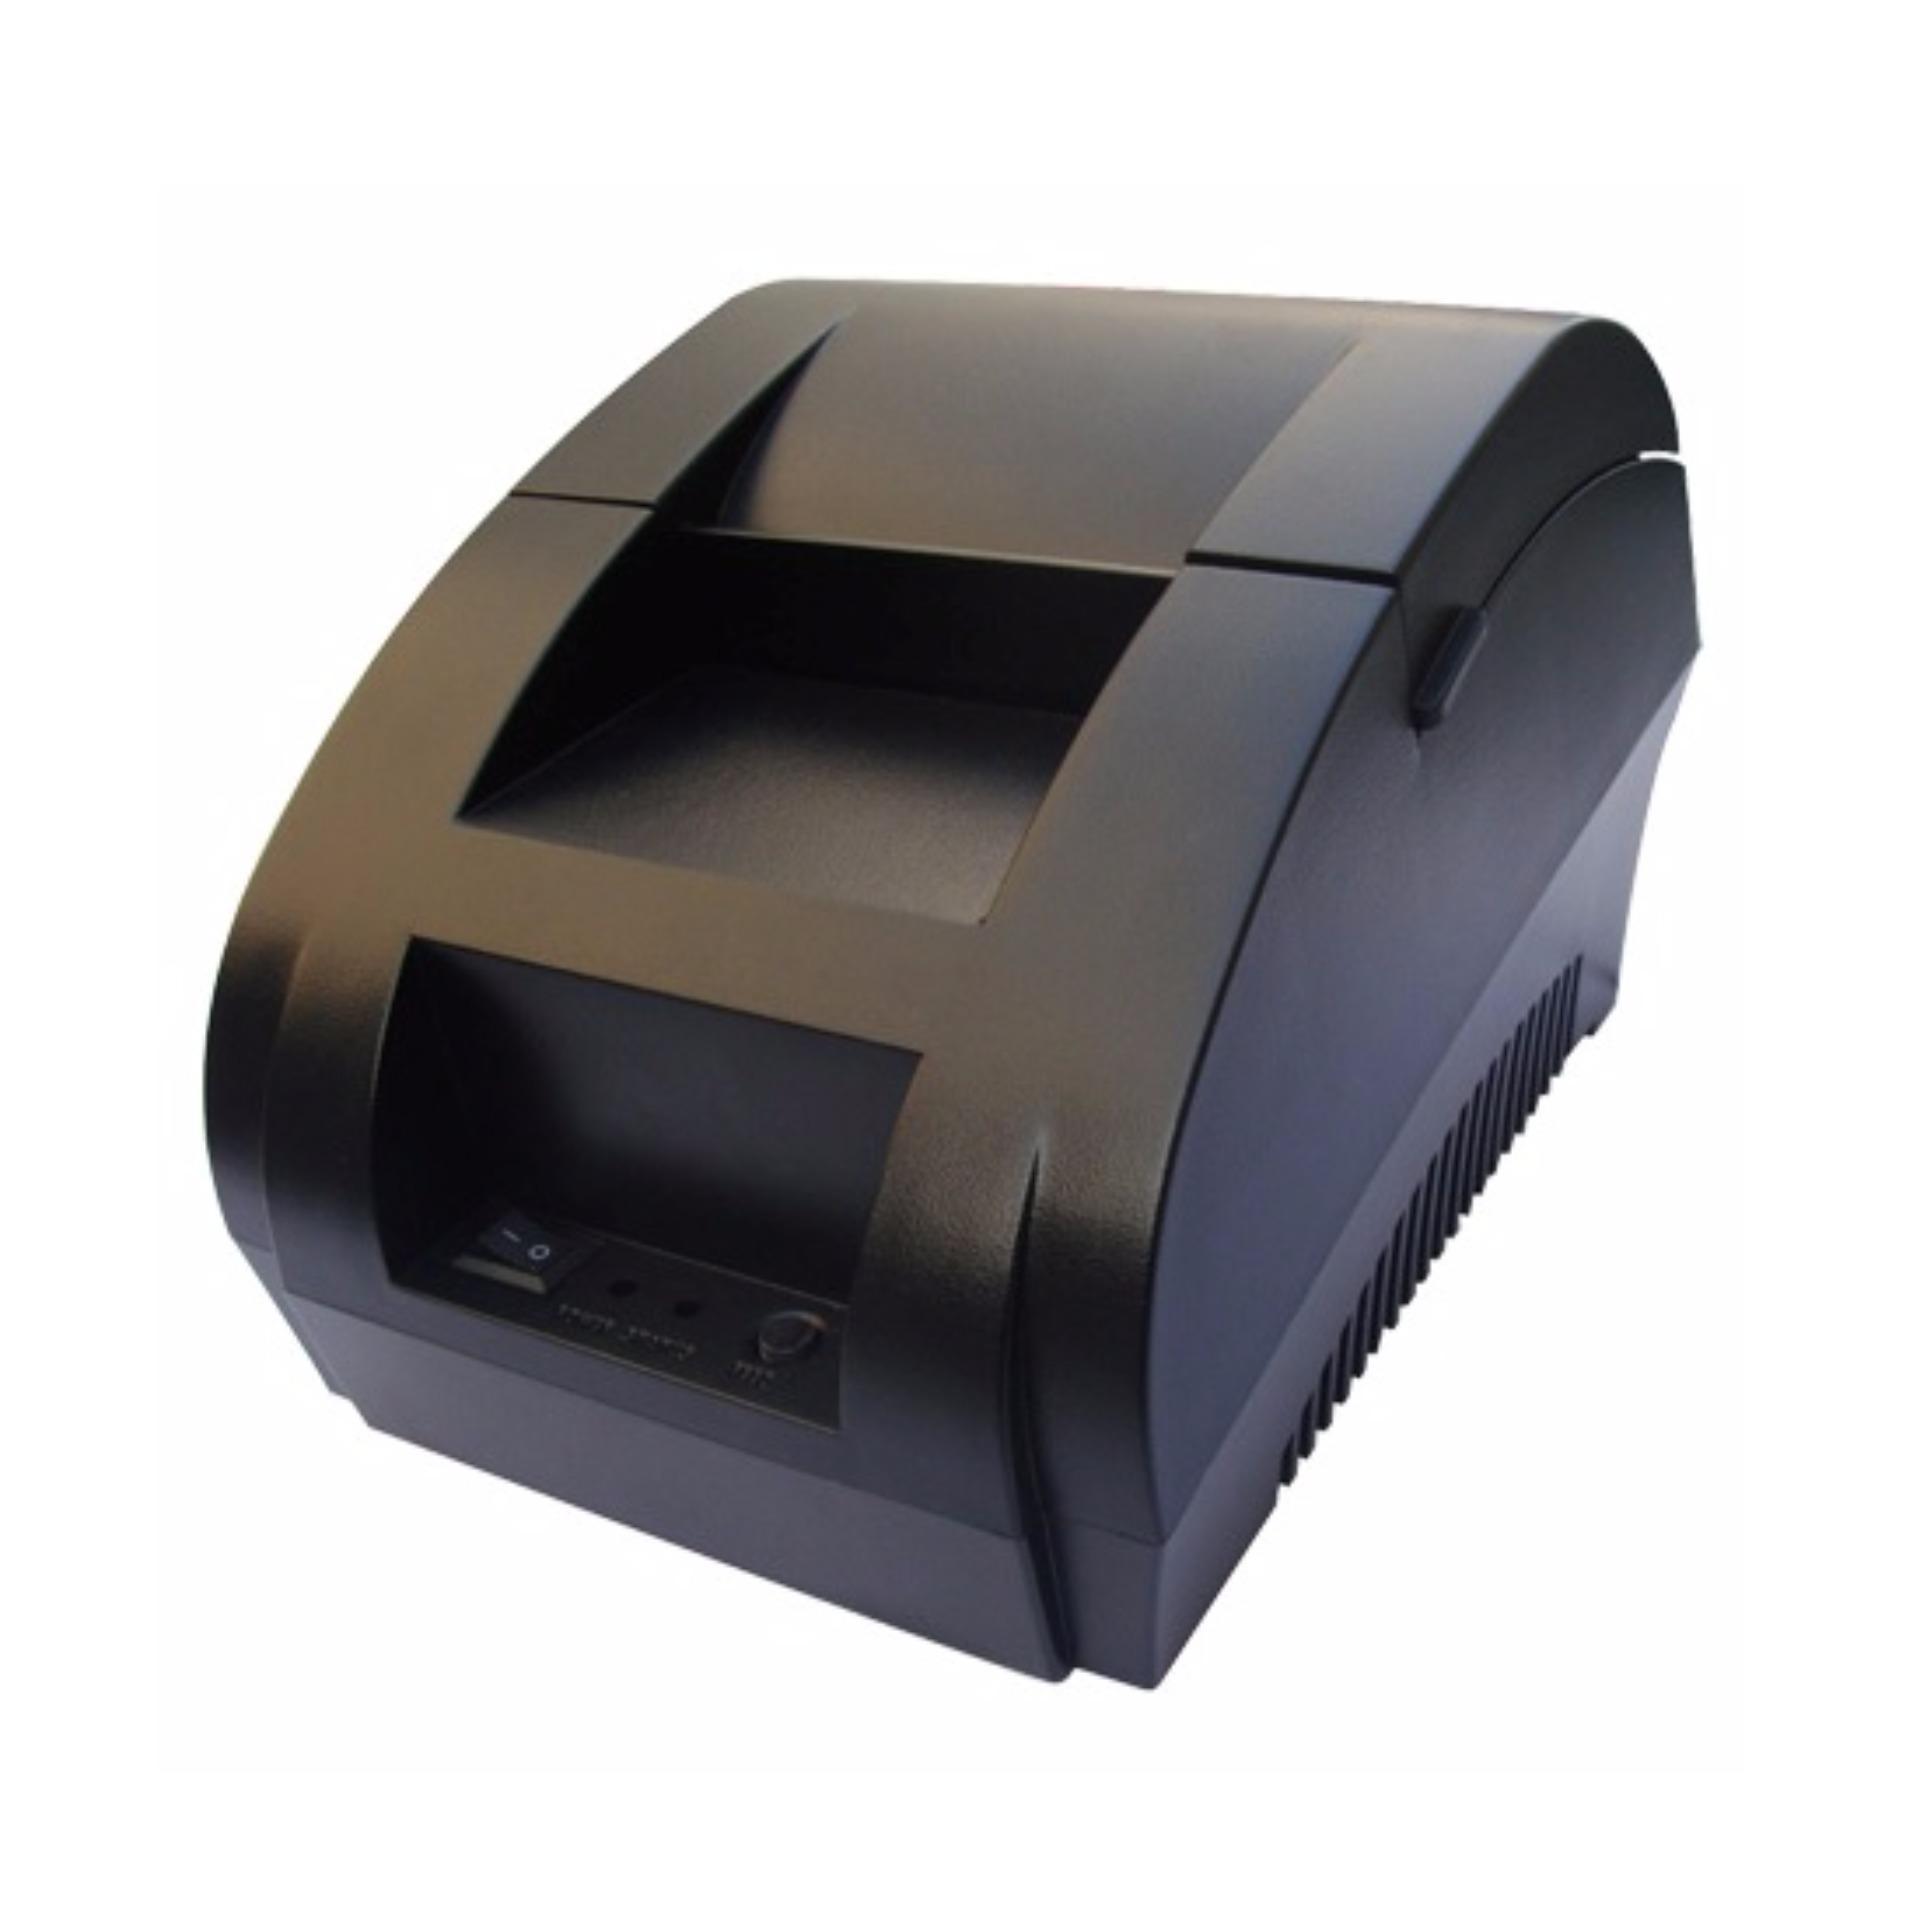 Symcode POS Thermal Receipt Printer 58mm - ZJ-5890K